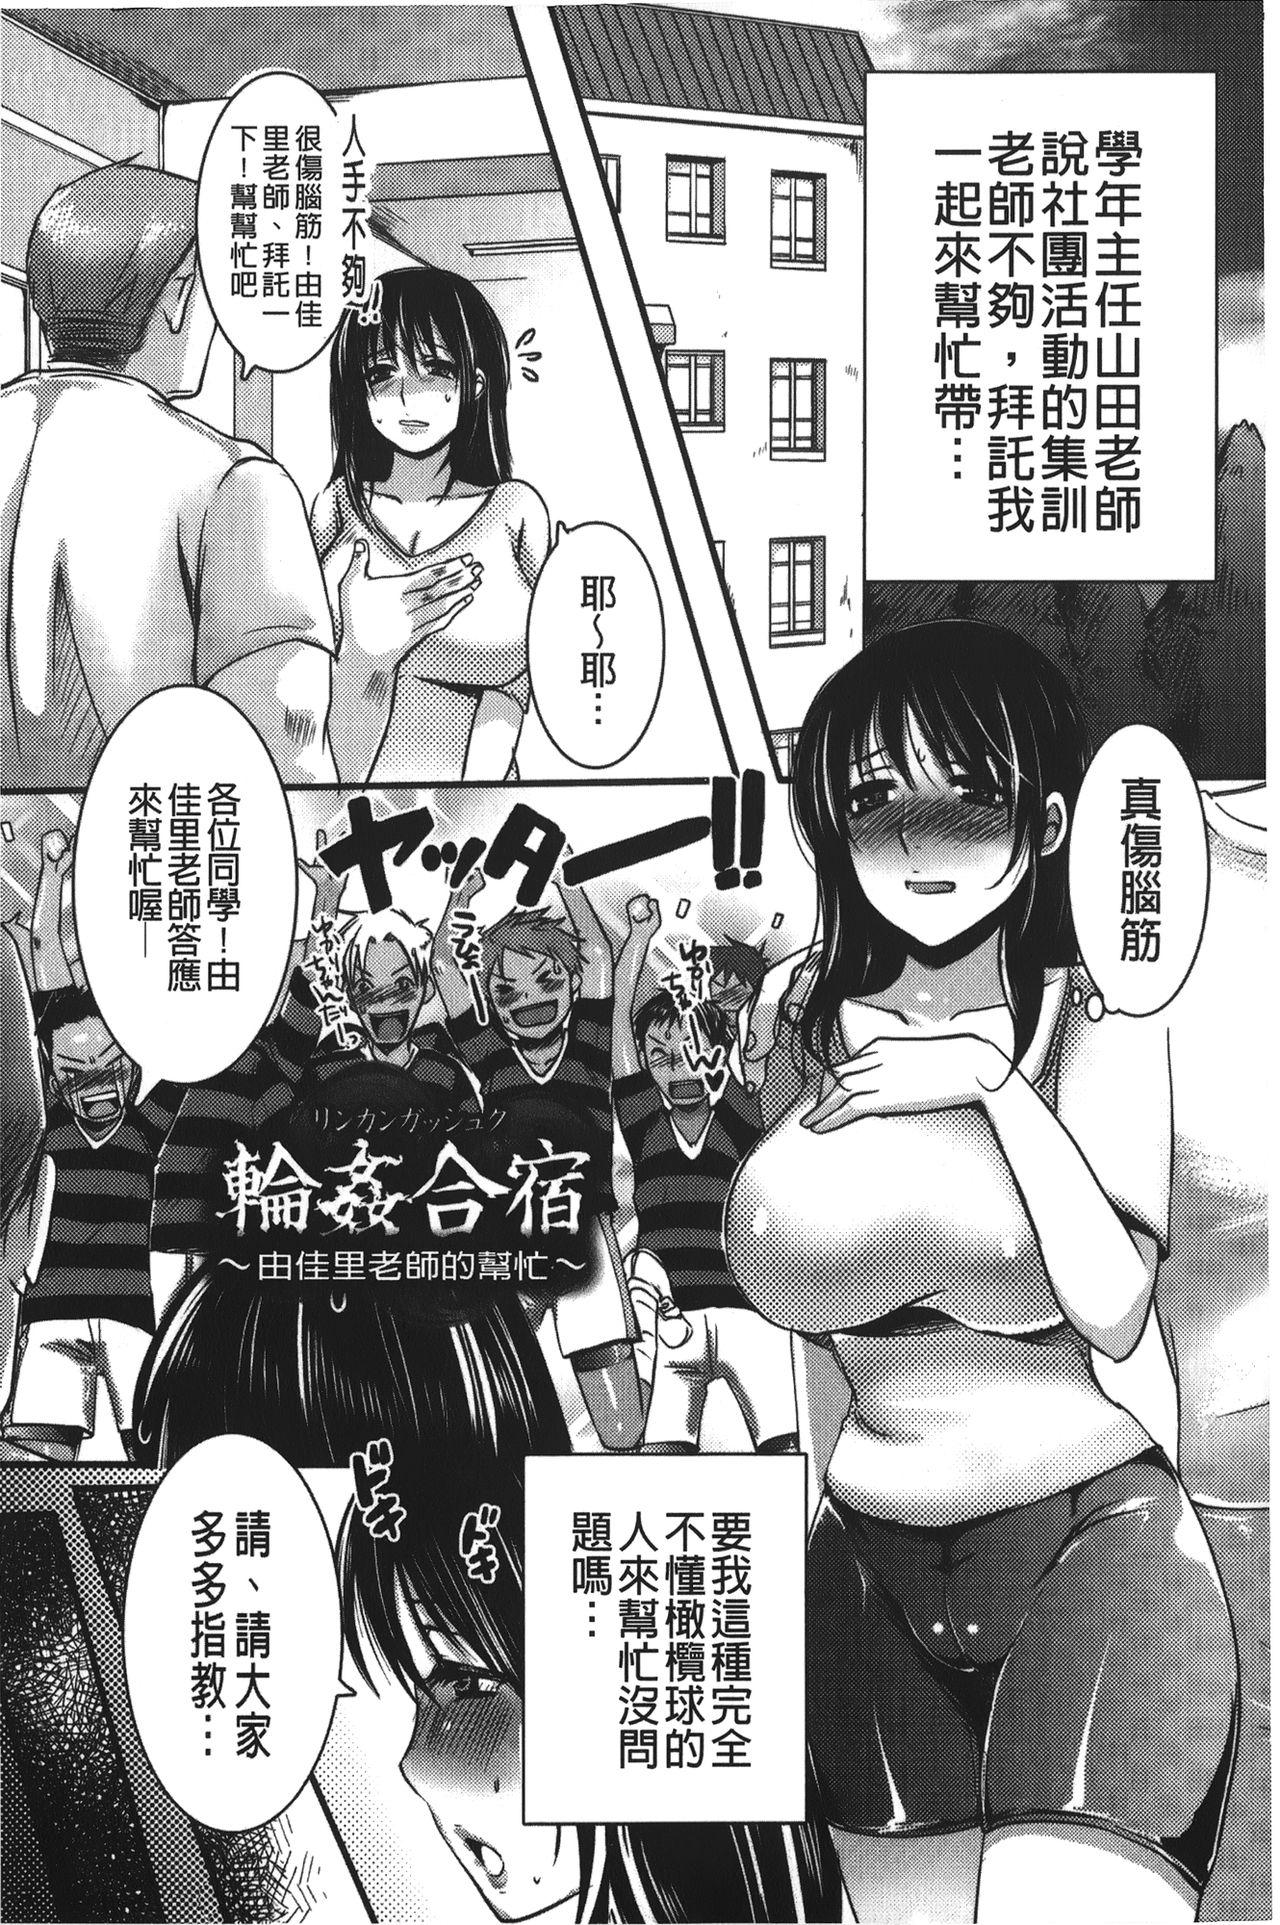 Kanjuku Torozuma 71